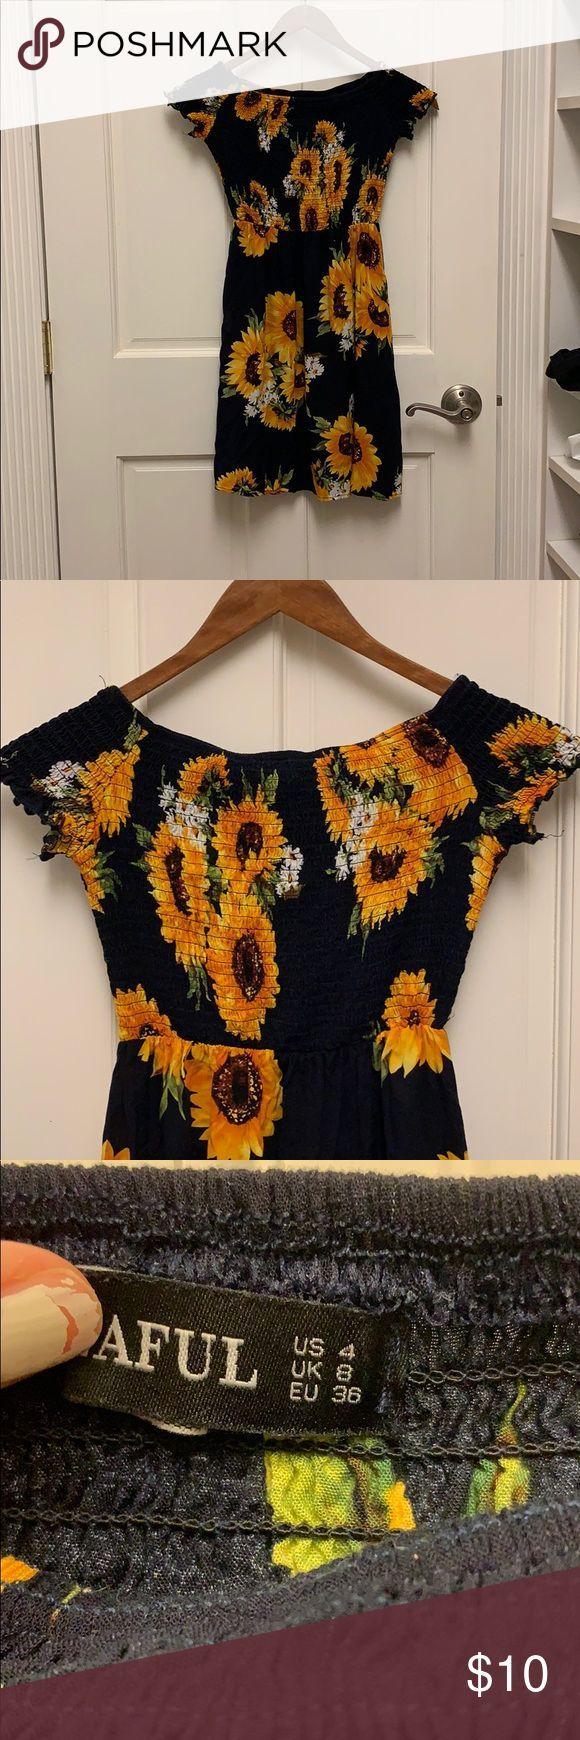 Sunflower Dress ZAFUL summer dress would fit great for kids Zaful Dresses Casua#Skincare #Skin #ClearSkin #AntiAging #Collagen #HealthySkin #FaceMask #SkincareTips #SkinCareJunkie #SkincareJunkie #SkinTreatment #SkincareTips #SkincareRoutine #Acne #FaceCare #facecare